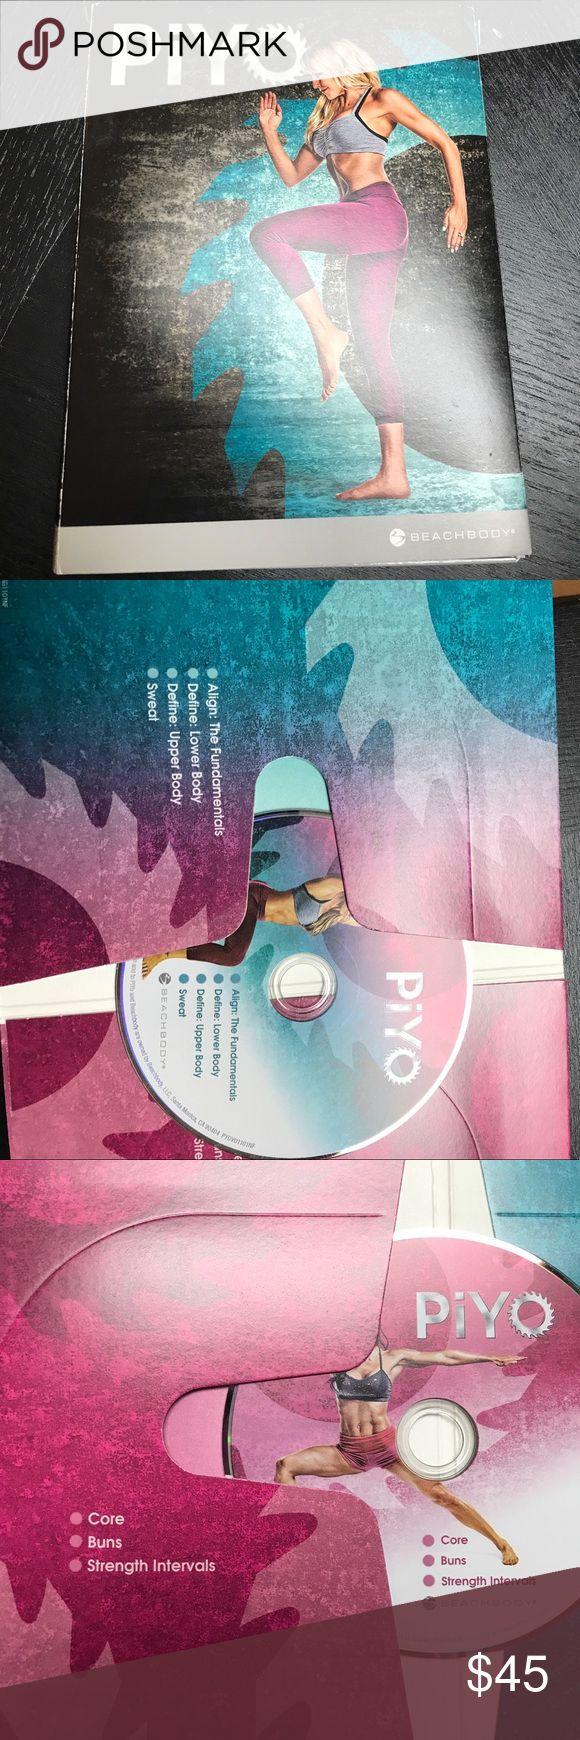 PIYO PIYO DVD set plus 2 extra, calendar and earring plan Other